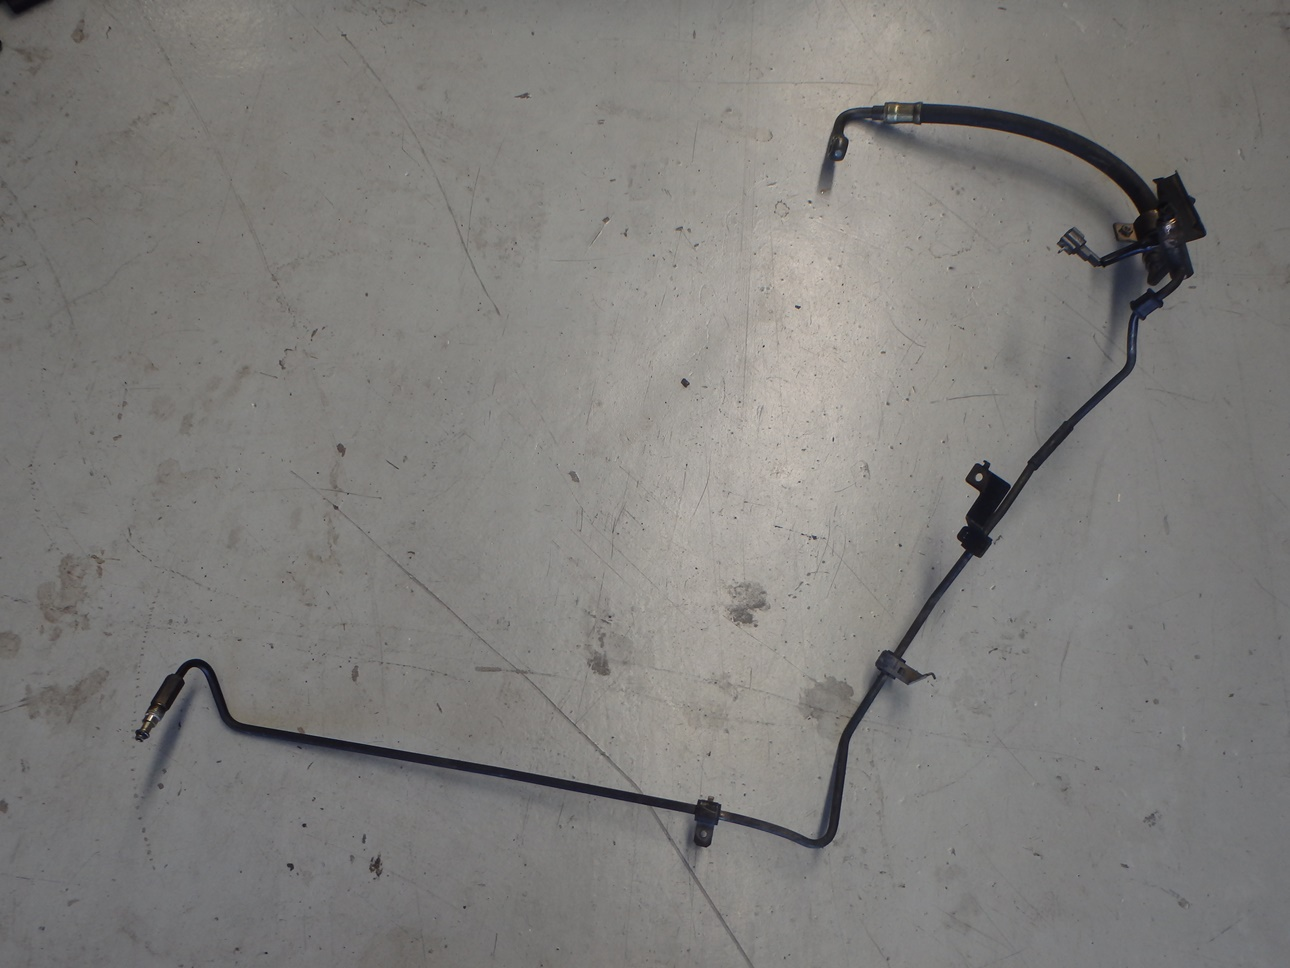 Details about Nissan Skyline R33 GTR BCNR33 High Pressure Power Steering  Hose Line Pipe